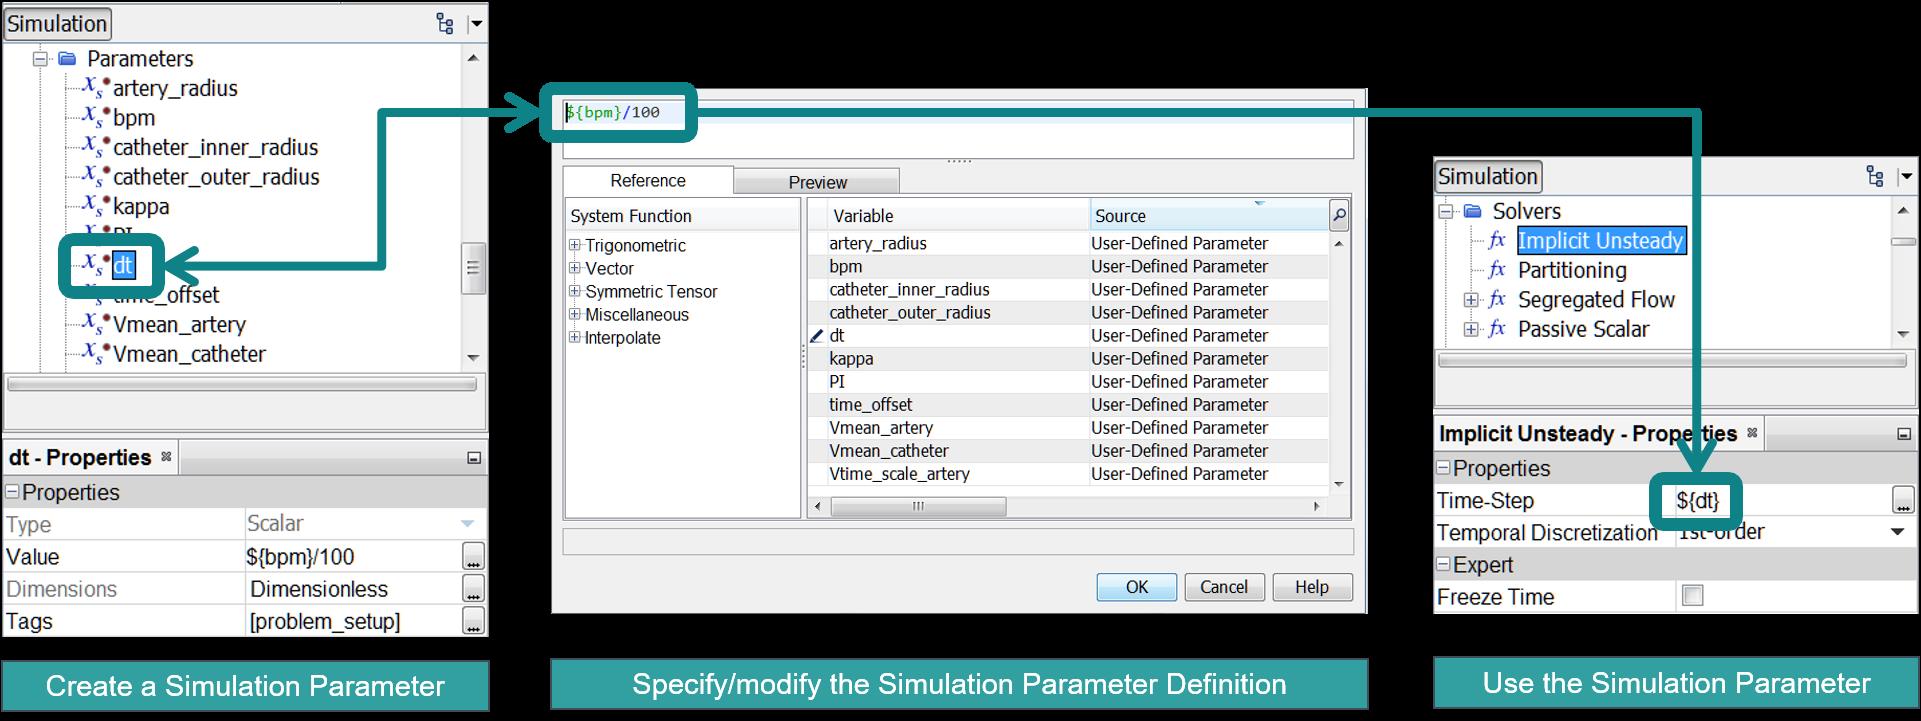 use_simulation_parameter.png